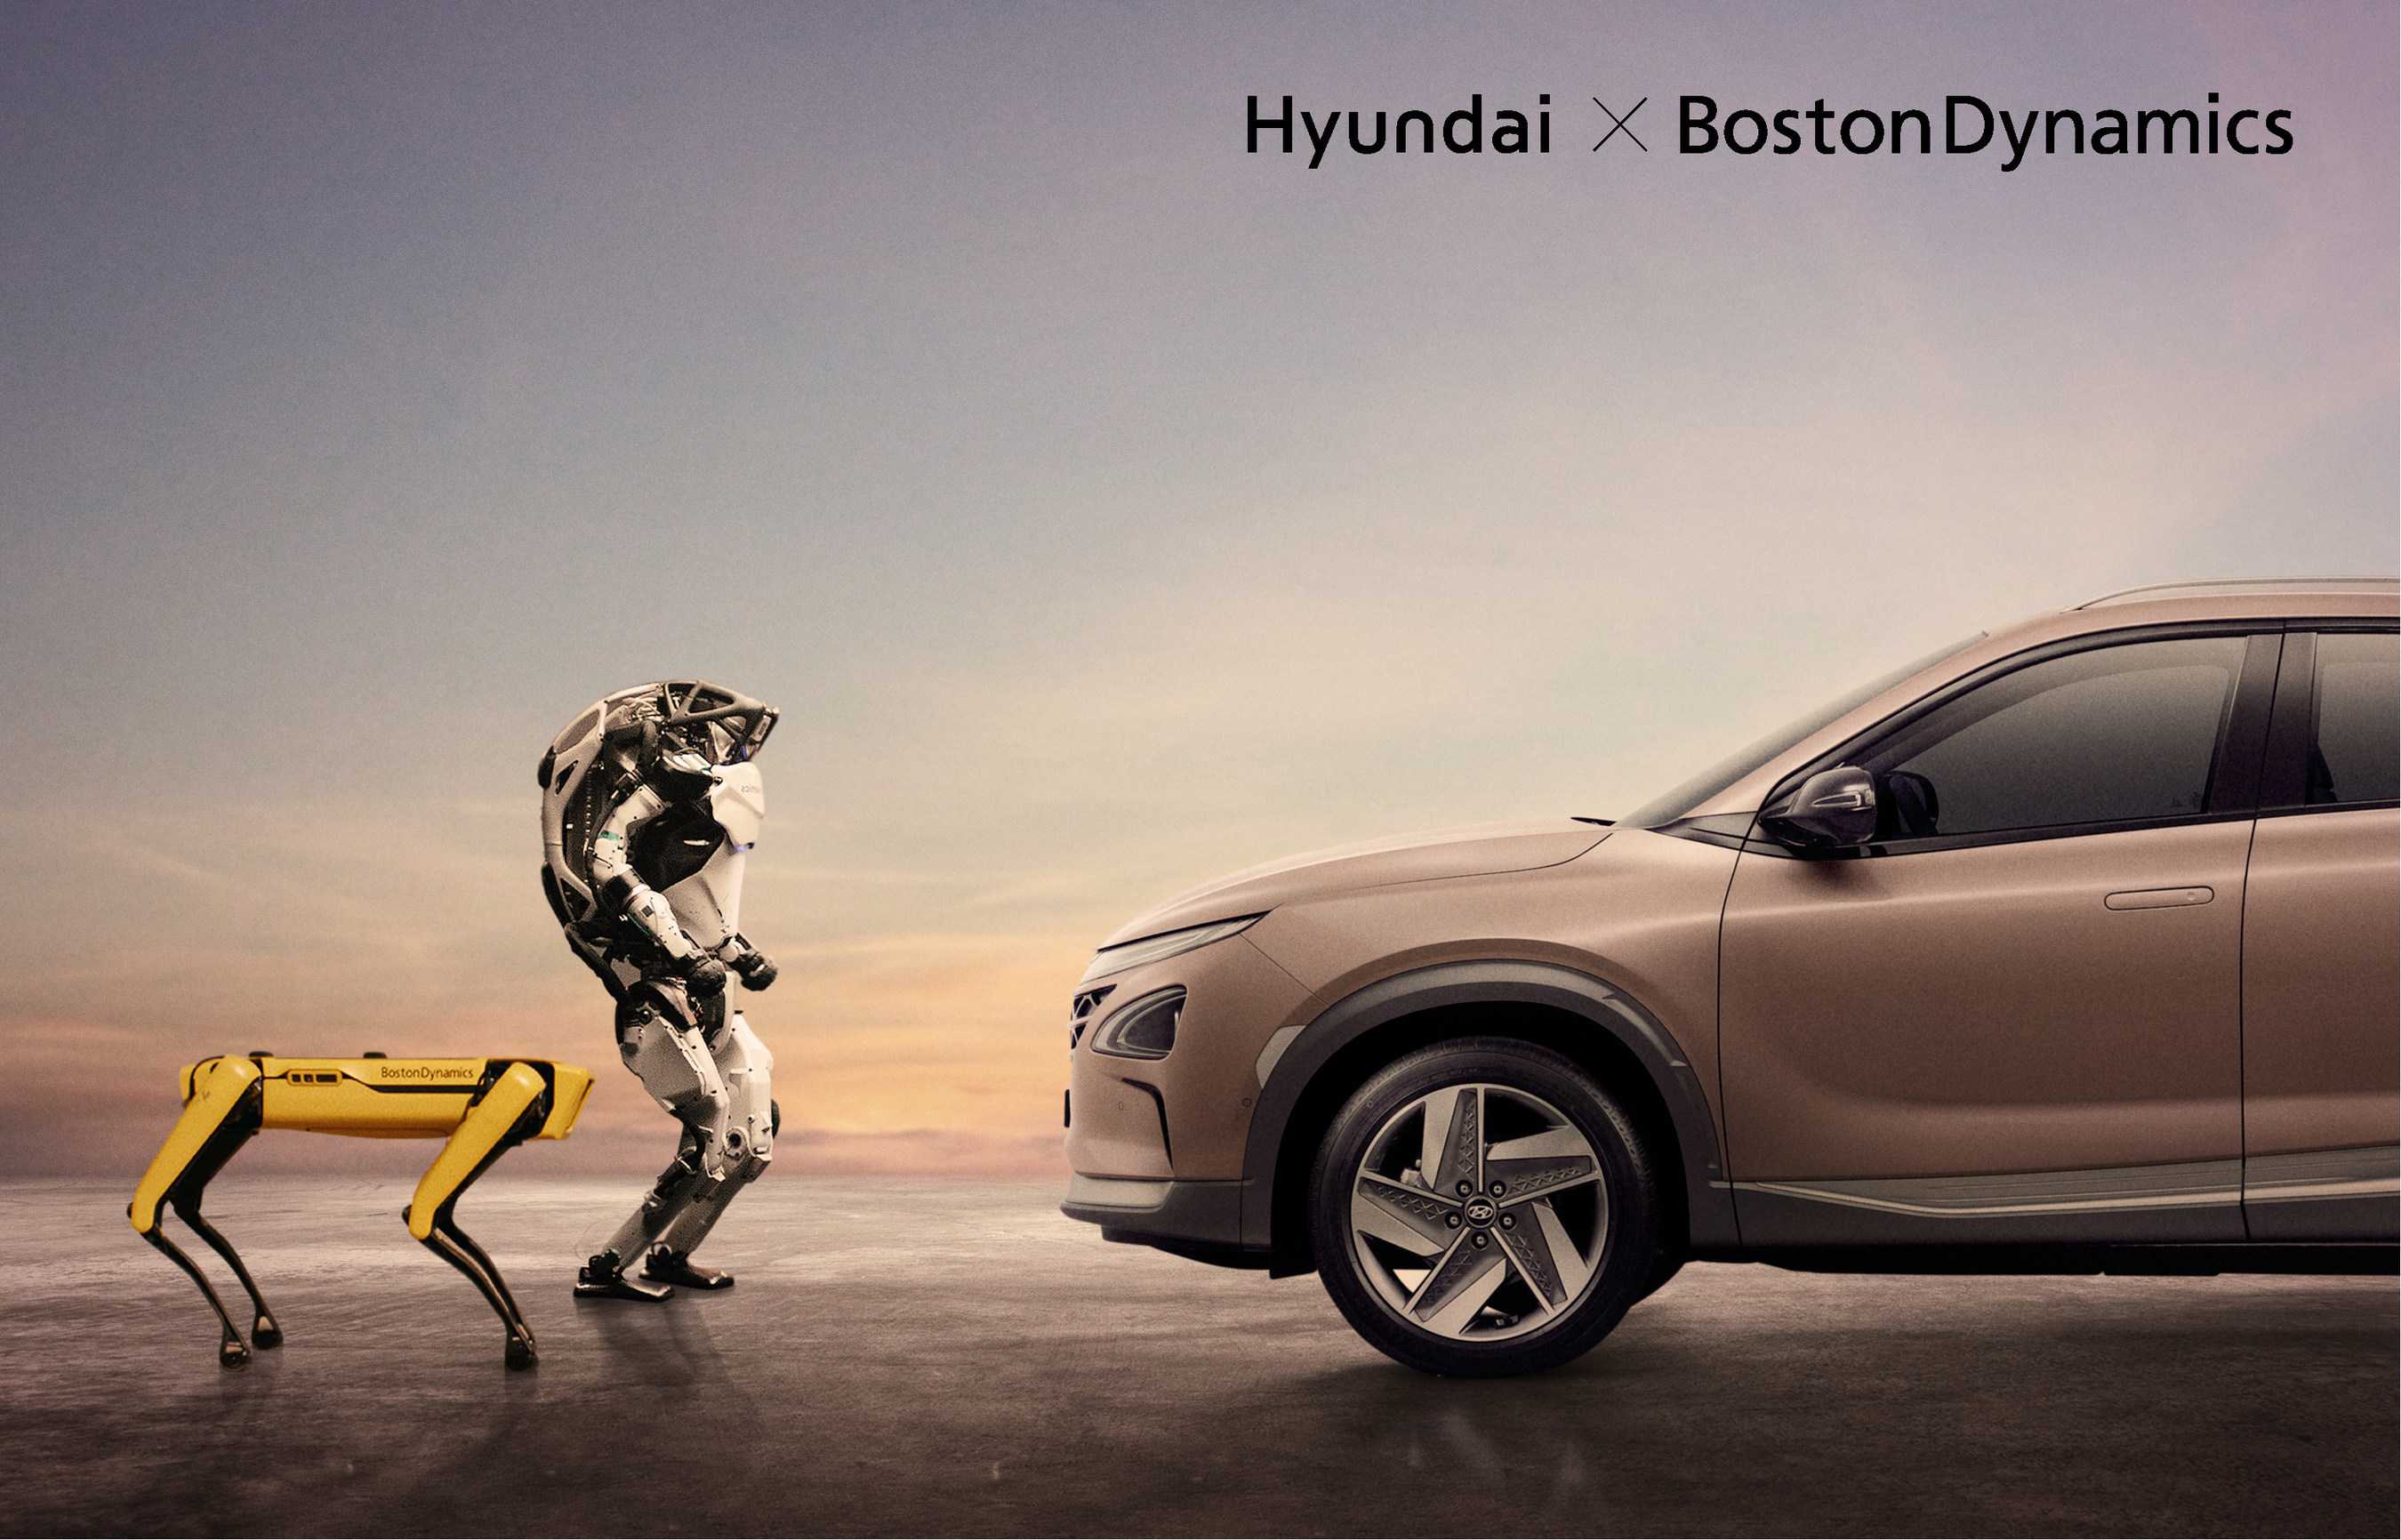 Hyundai now owns robot dog maker Boston Dynamics | Engadget